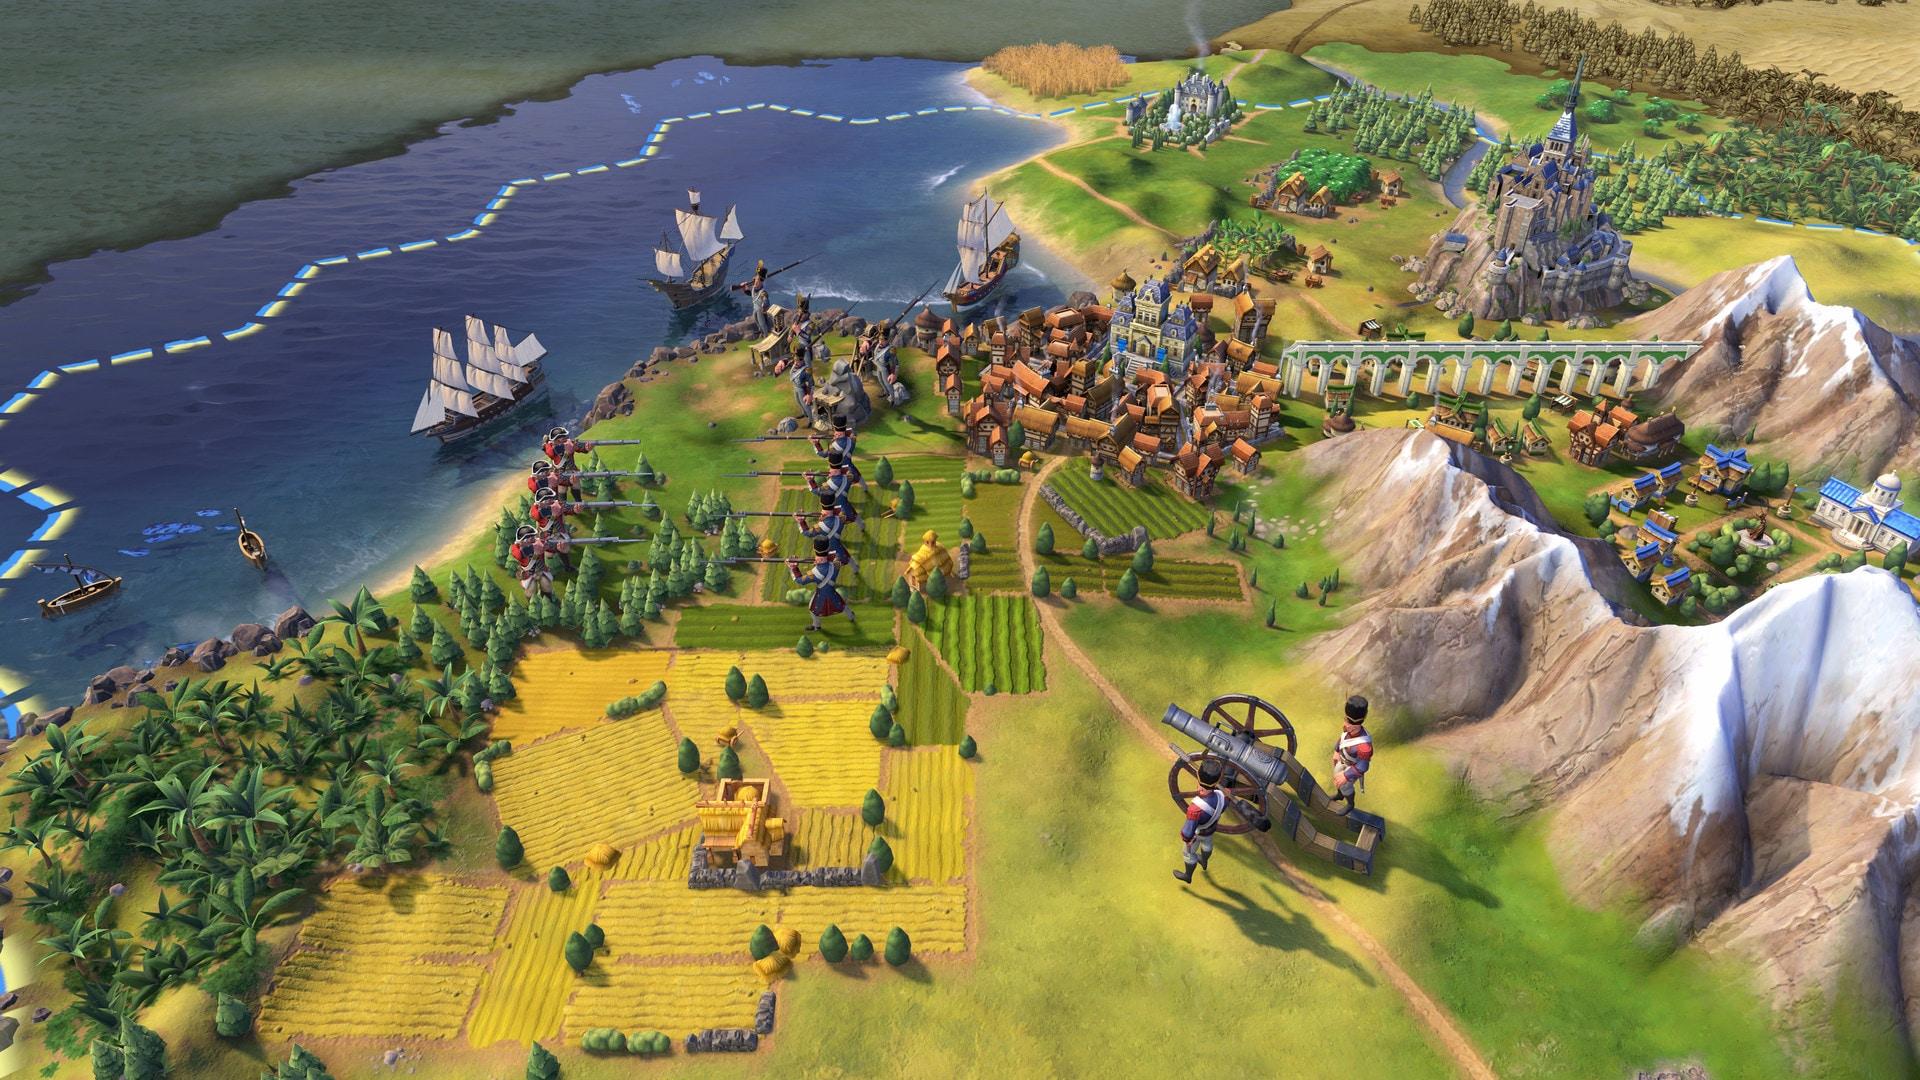 Sid Meier's Civilization VI Digital Deluxe Steam Key GLOBAL